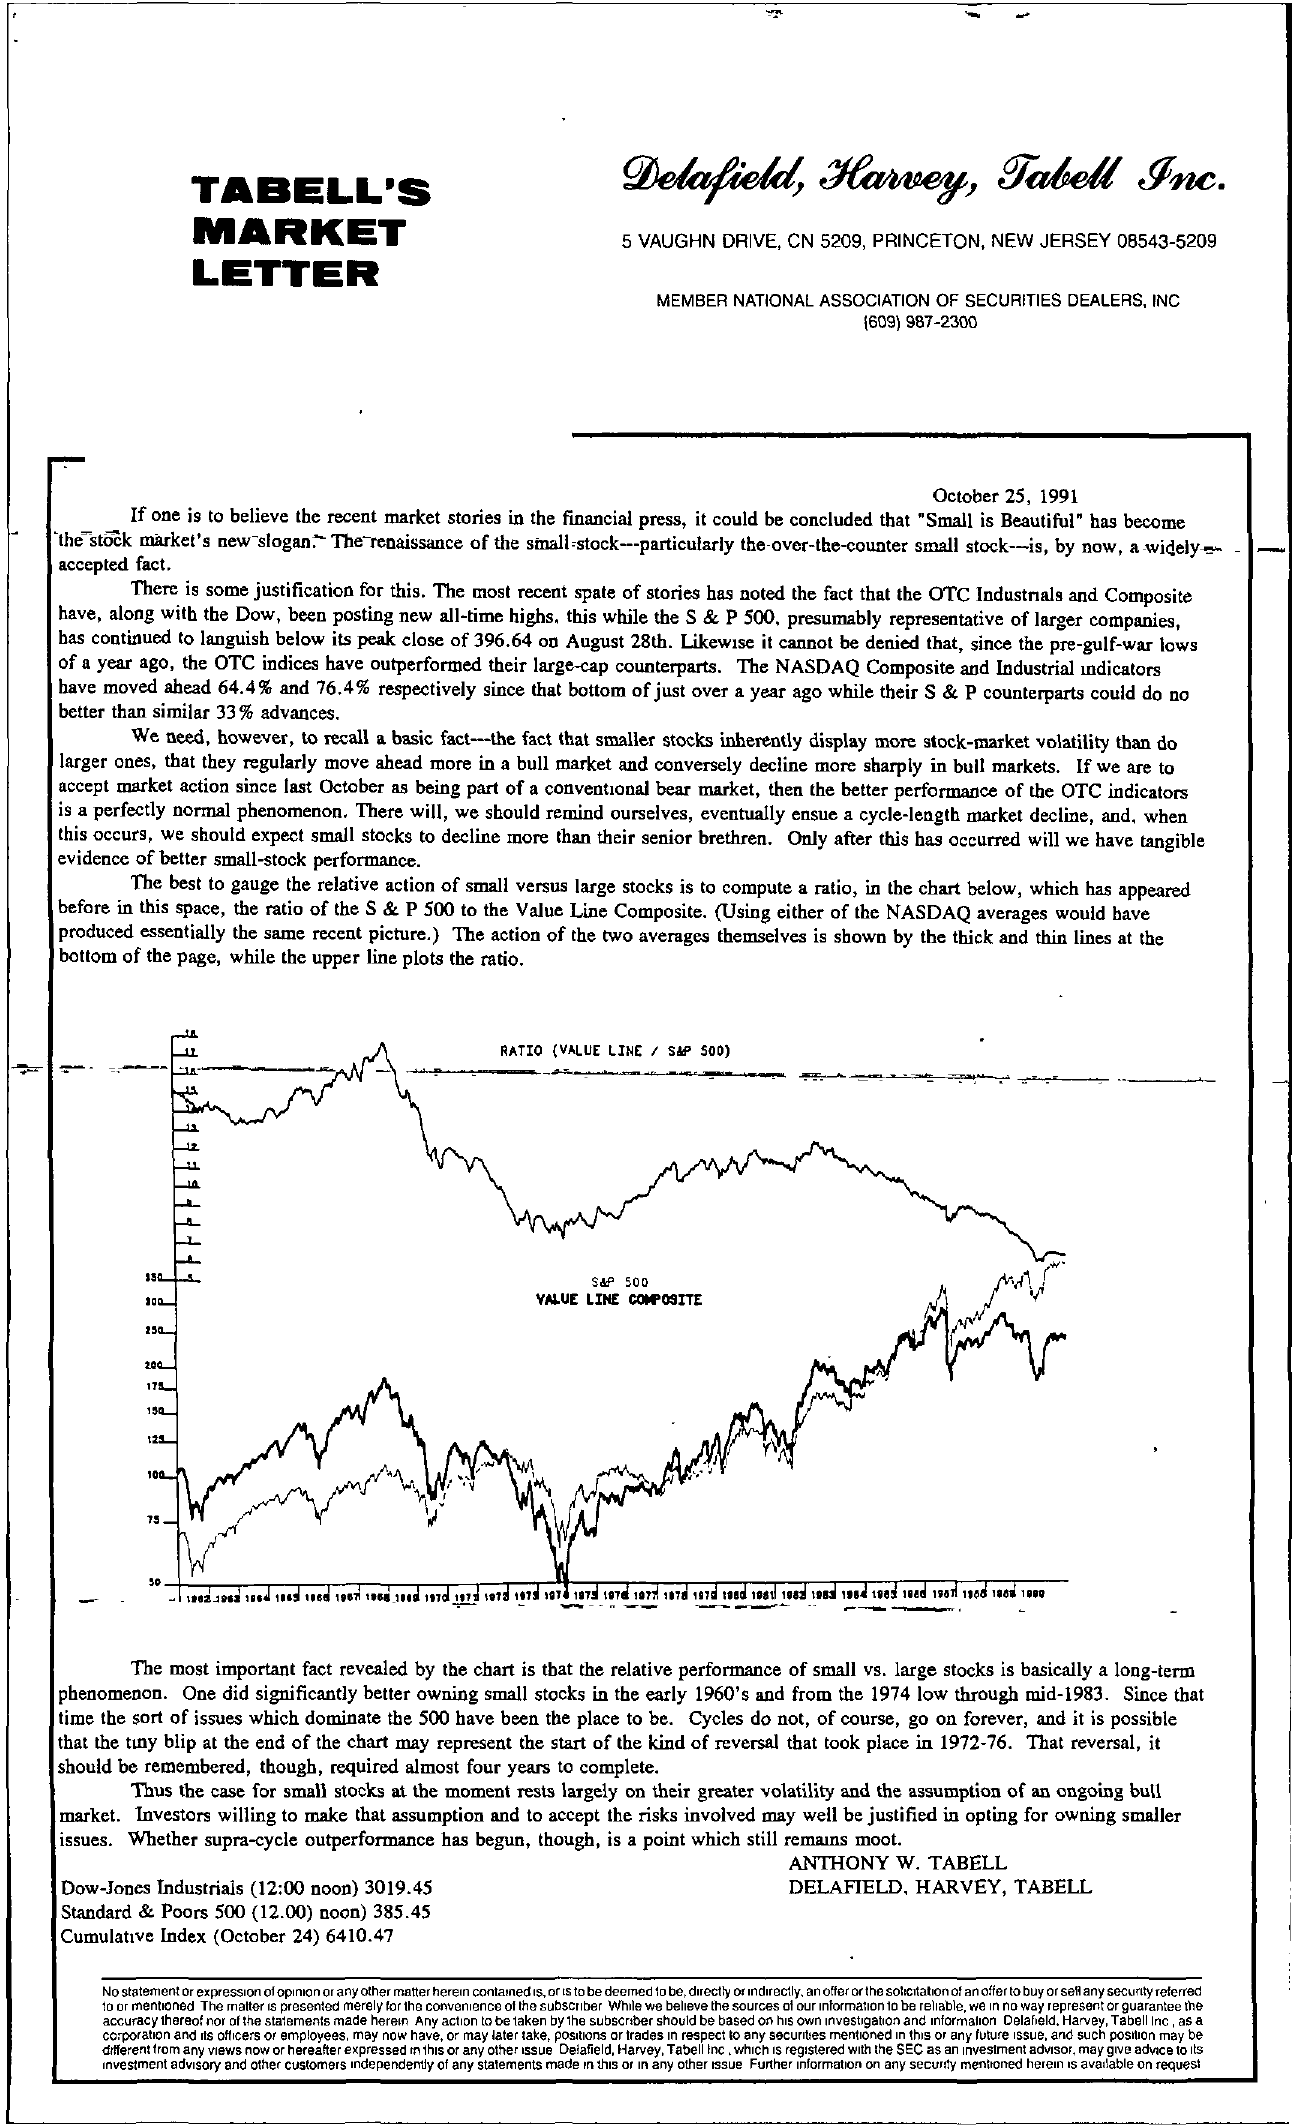 Tabell's Market Letter - October 25, 1991